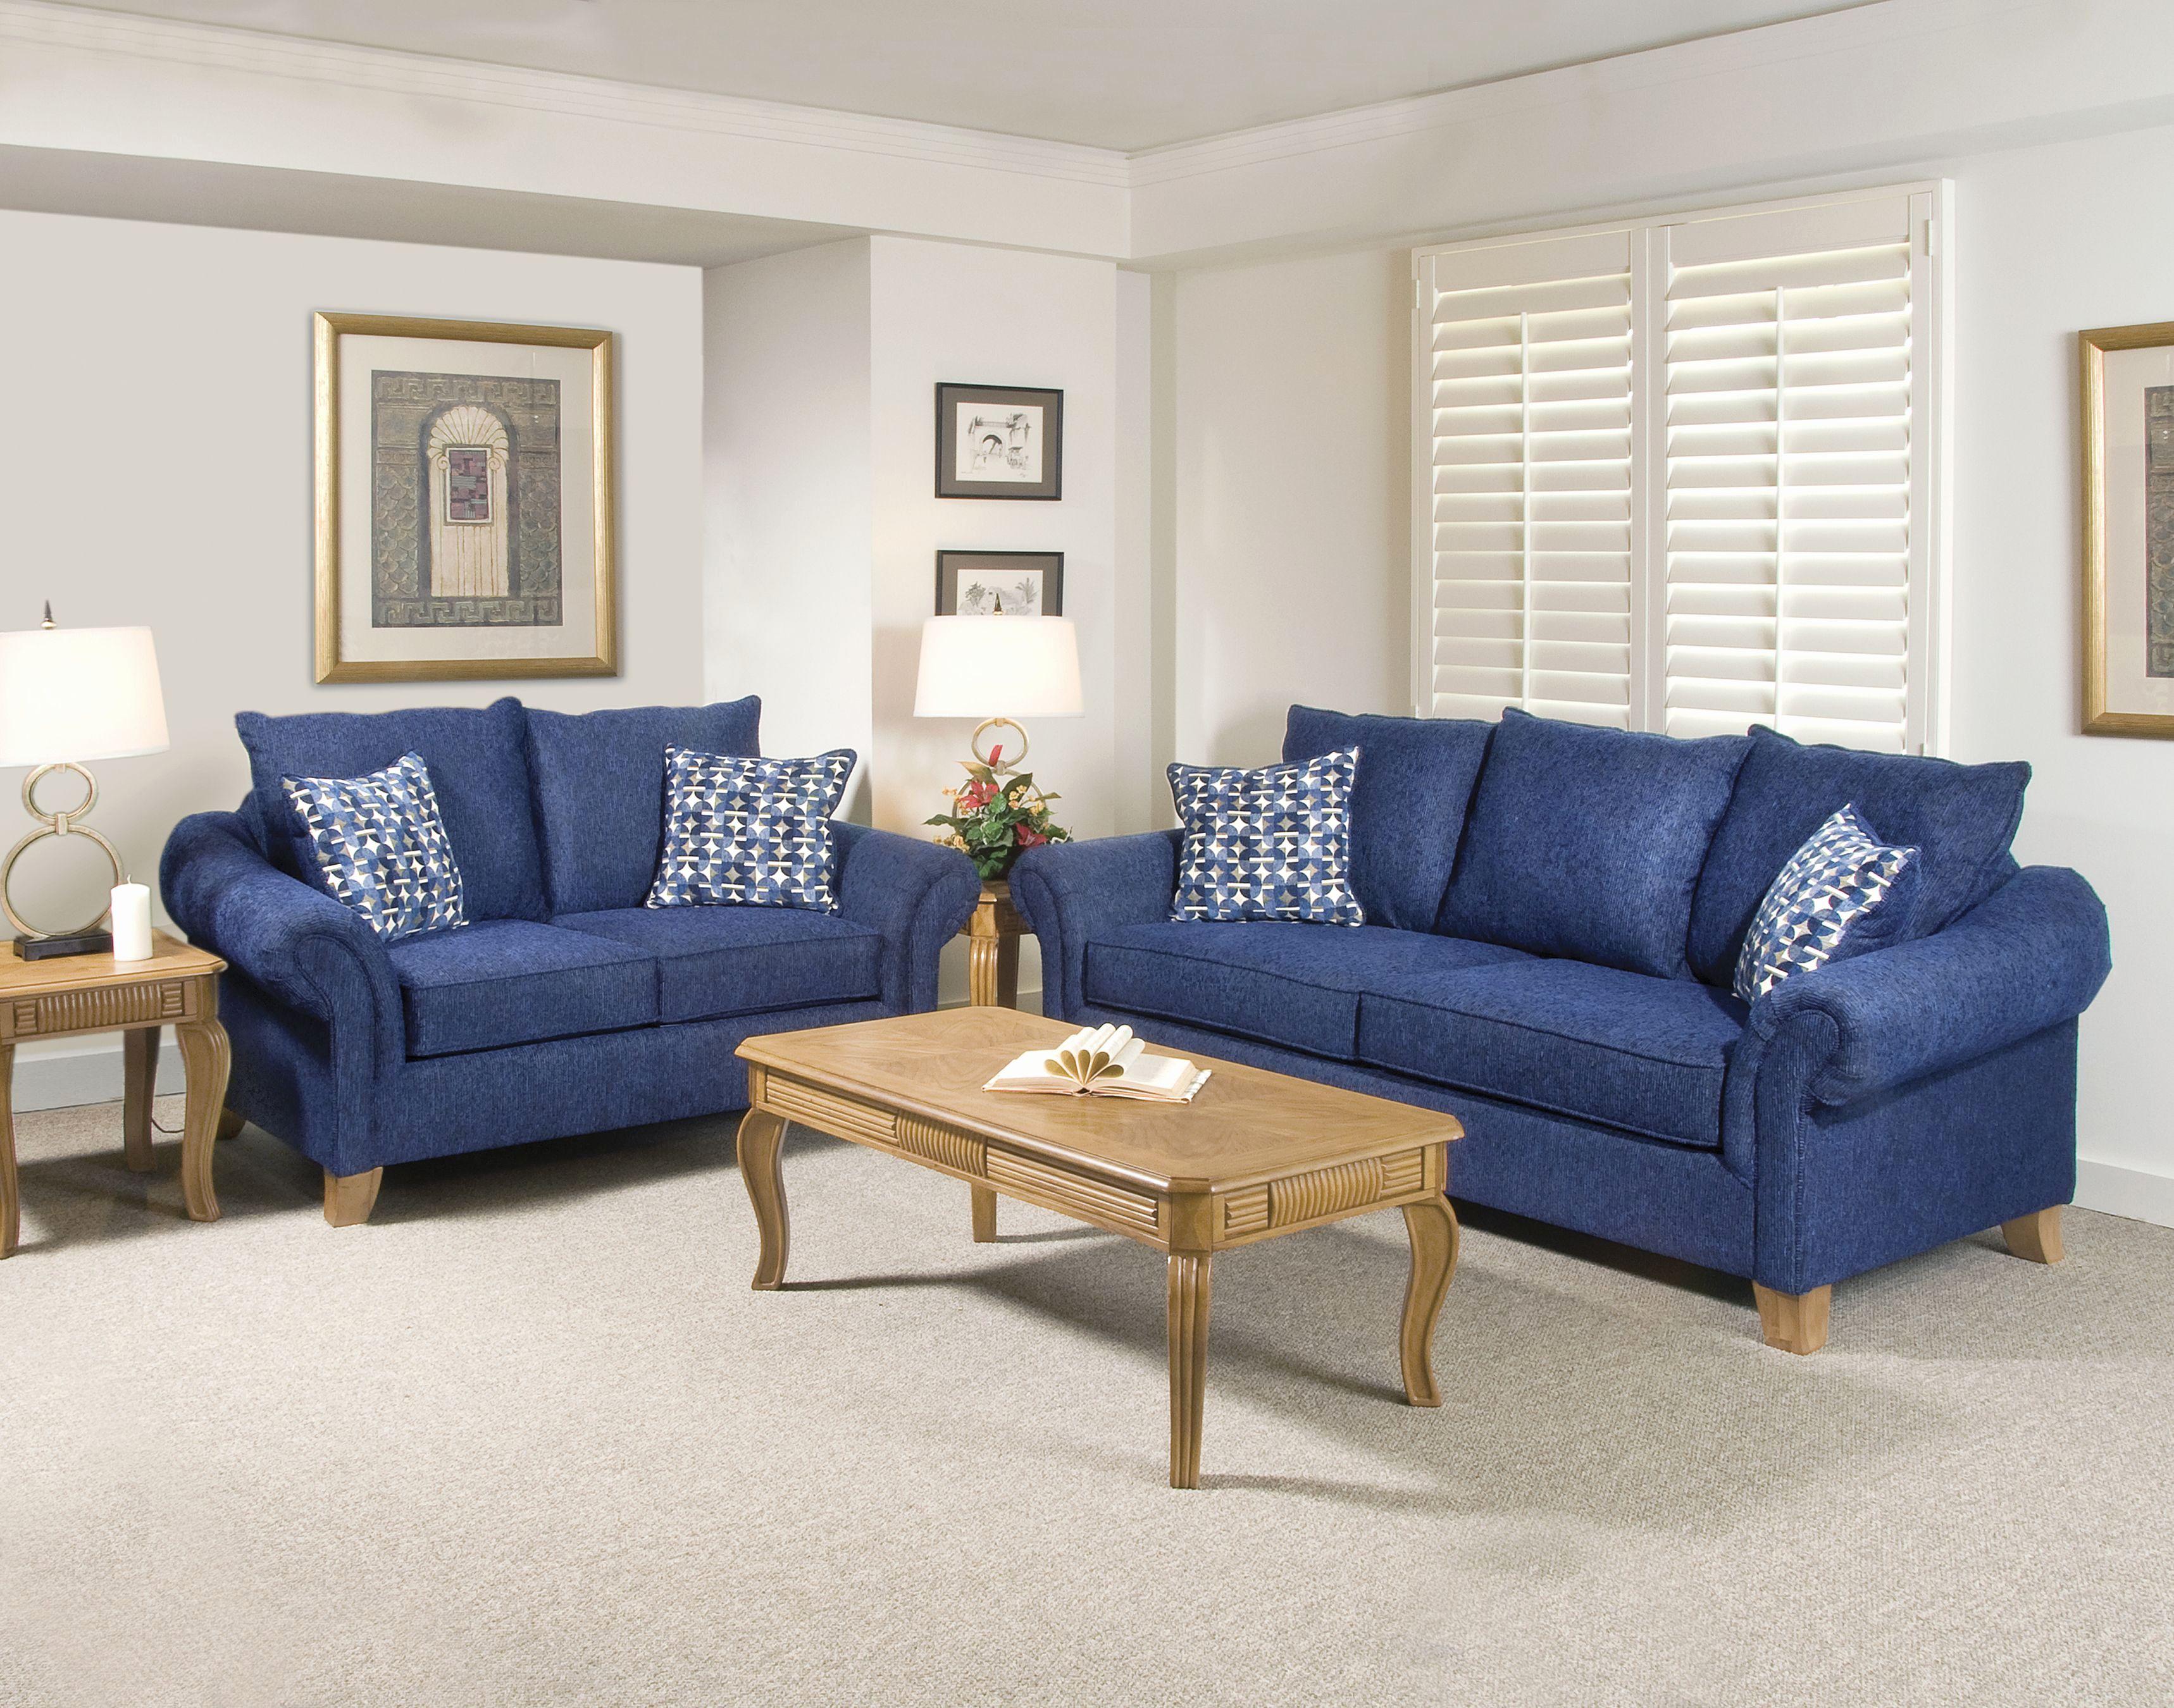 New Living Room Sofa Set Designs Picture Living Room Sofa Set